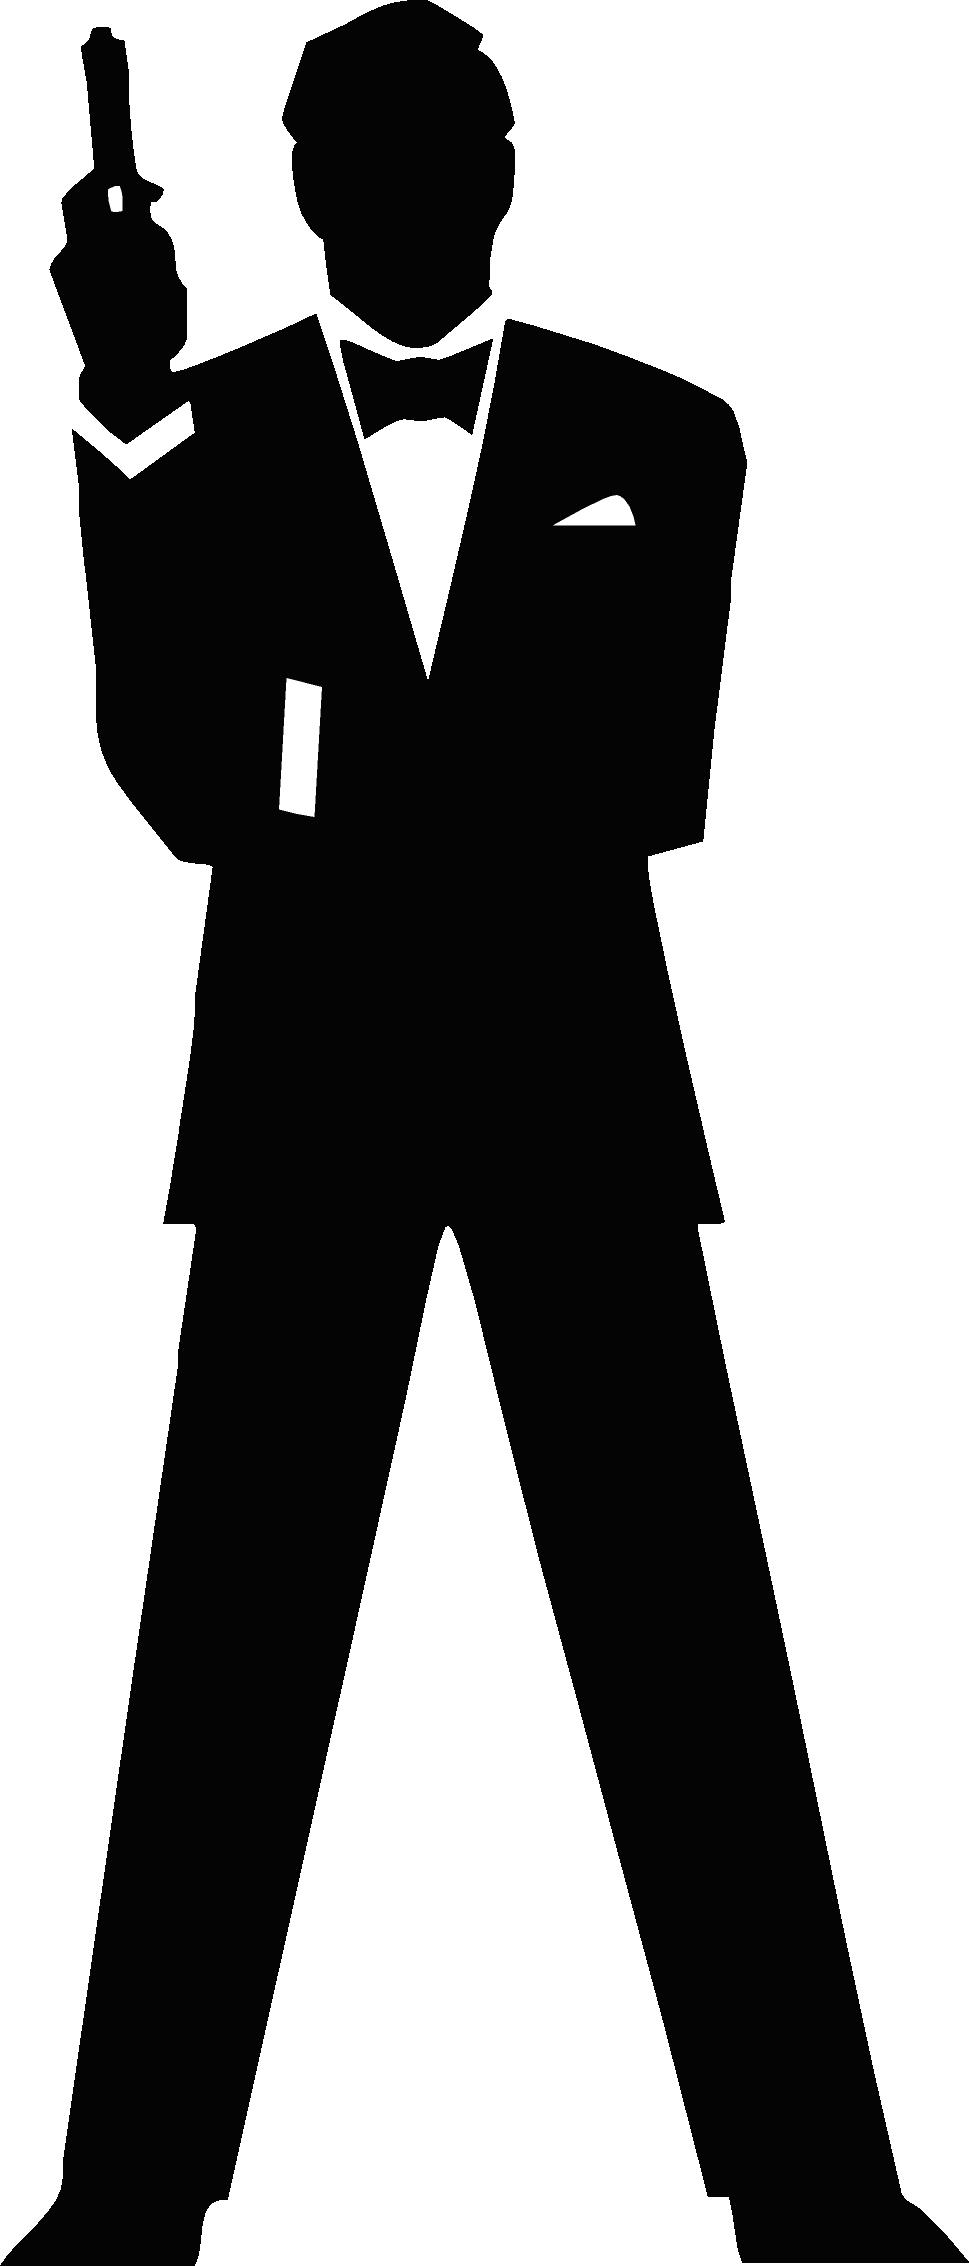 Agent Clipart: 007 James Bond Clipart-Agent clipart: 007 James Bond Clipart-4